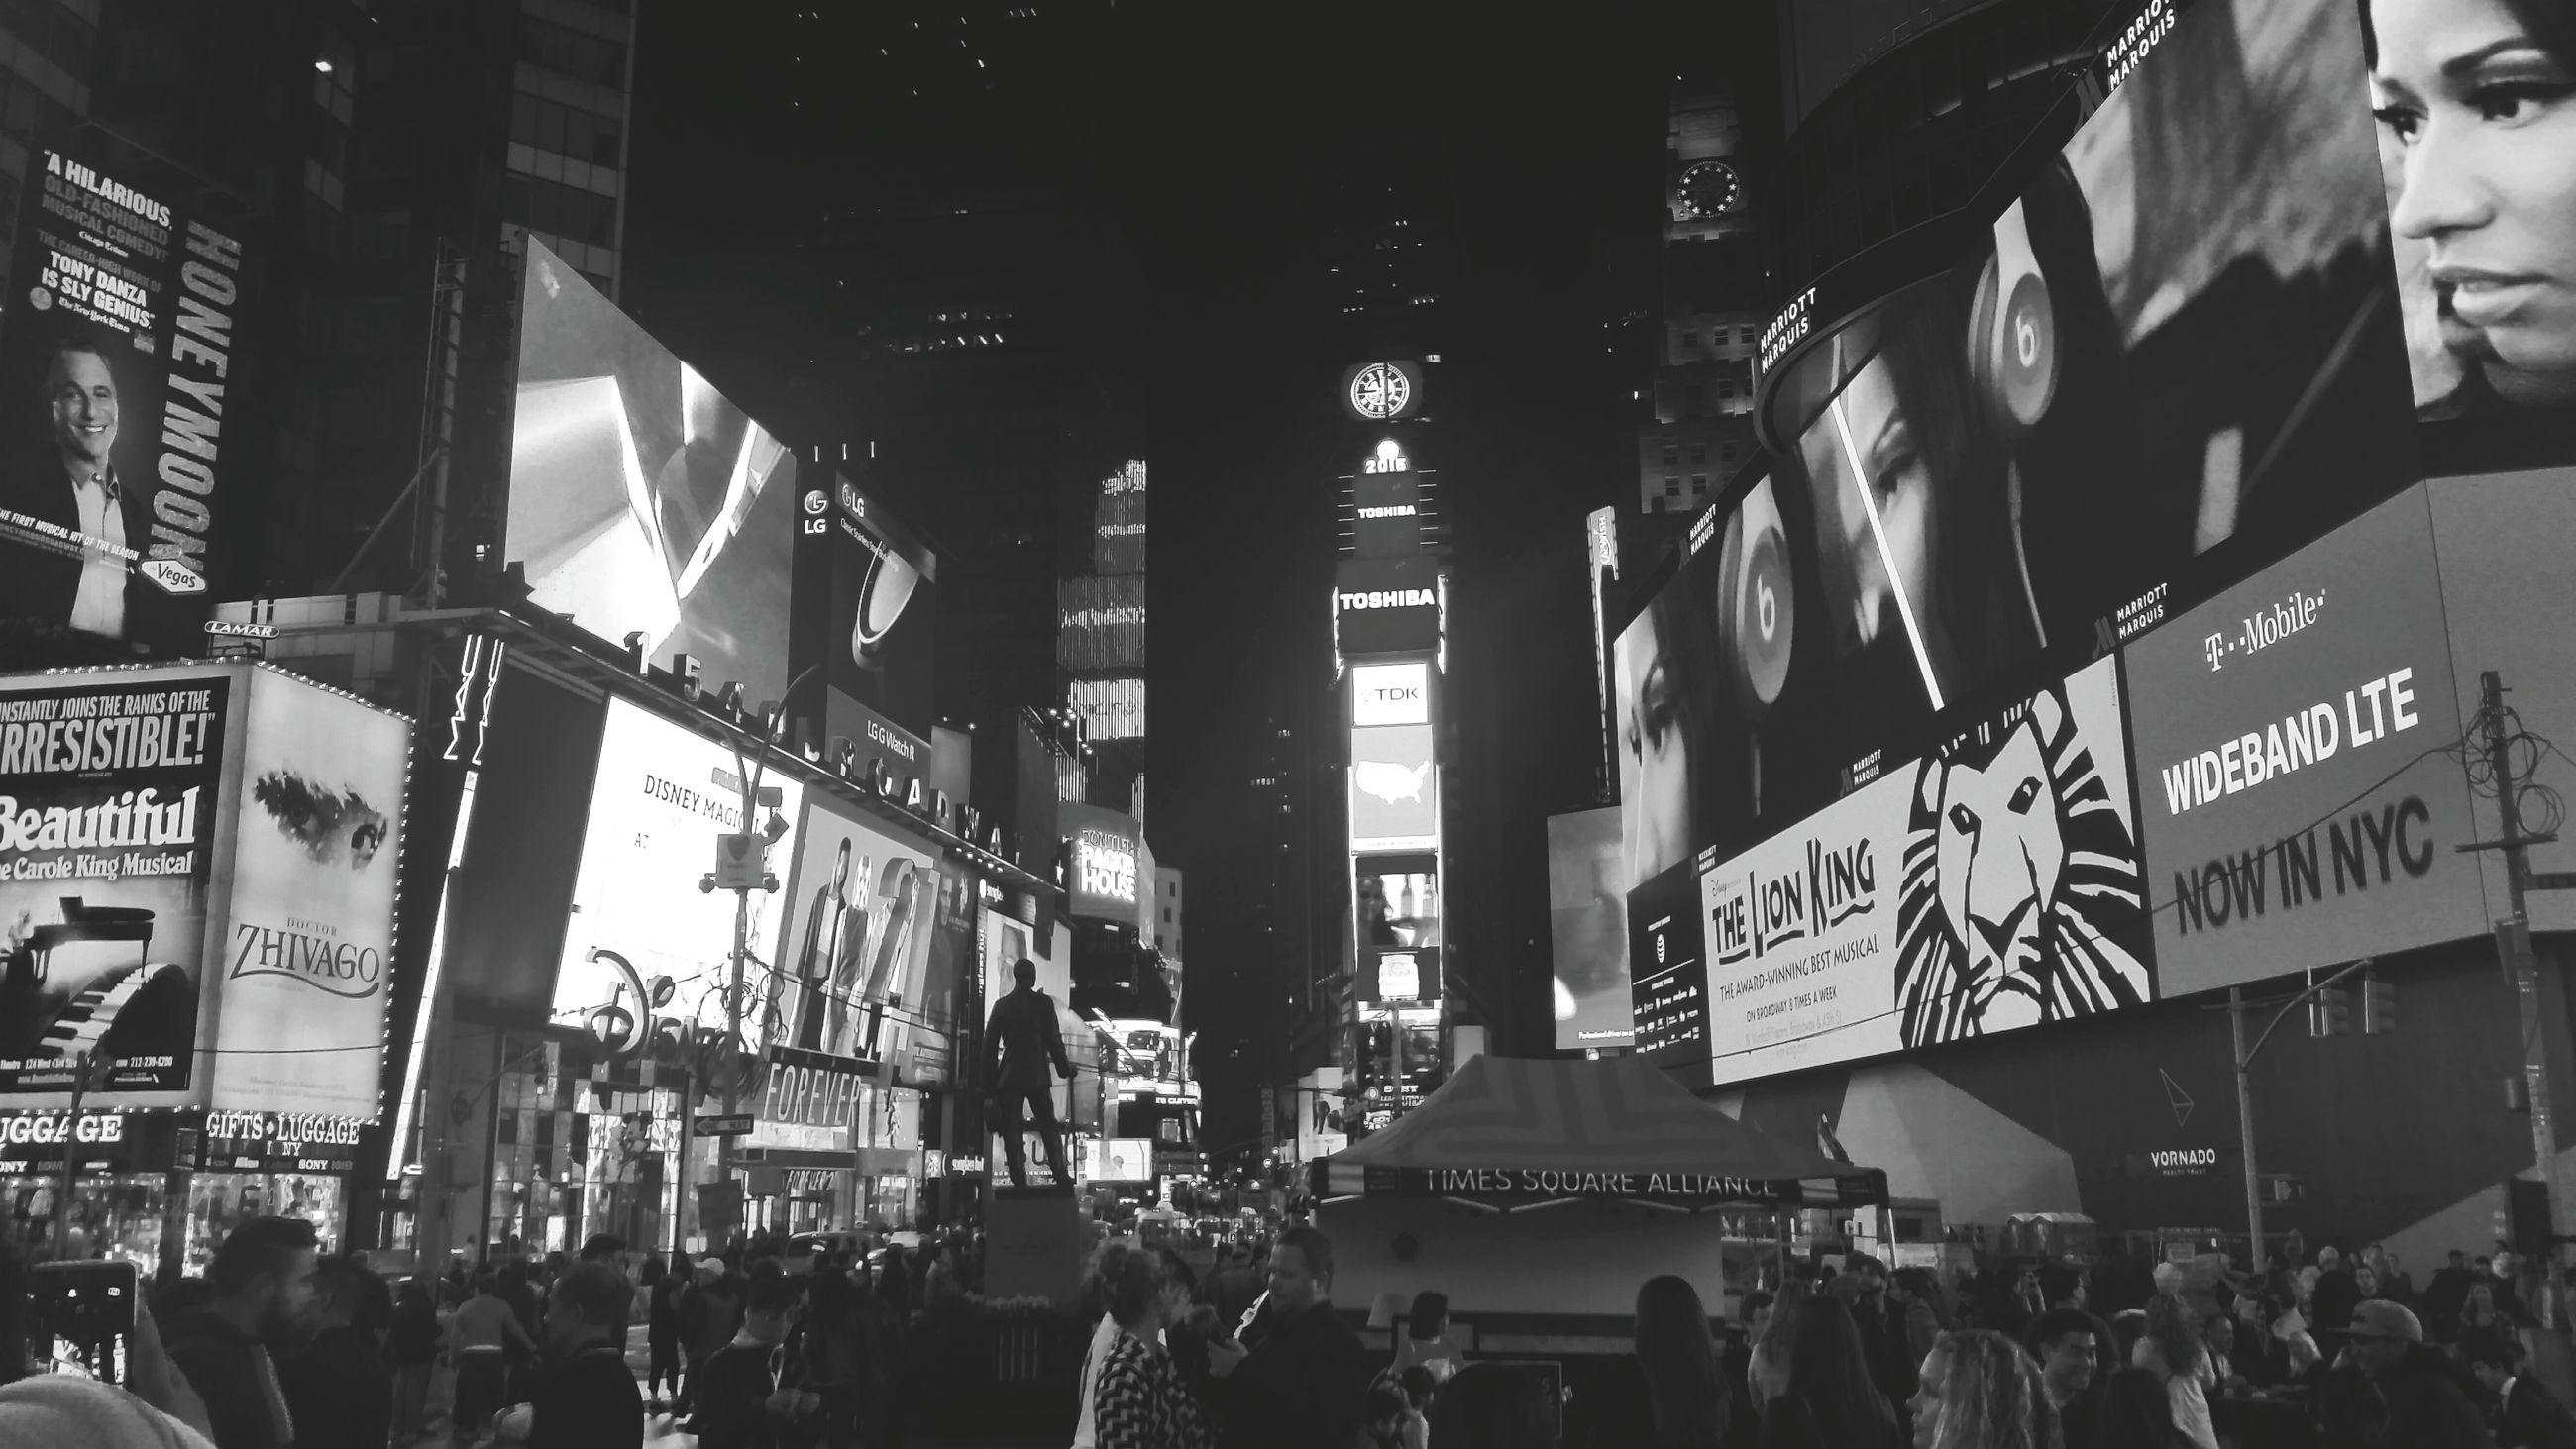 large group of people, text, men, person, architecture, crowd, built structure, western script, lifestyles, non-western script, communication, city, city life, building exterior, market, leisure activity, advertisement, shopping, walking